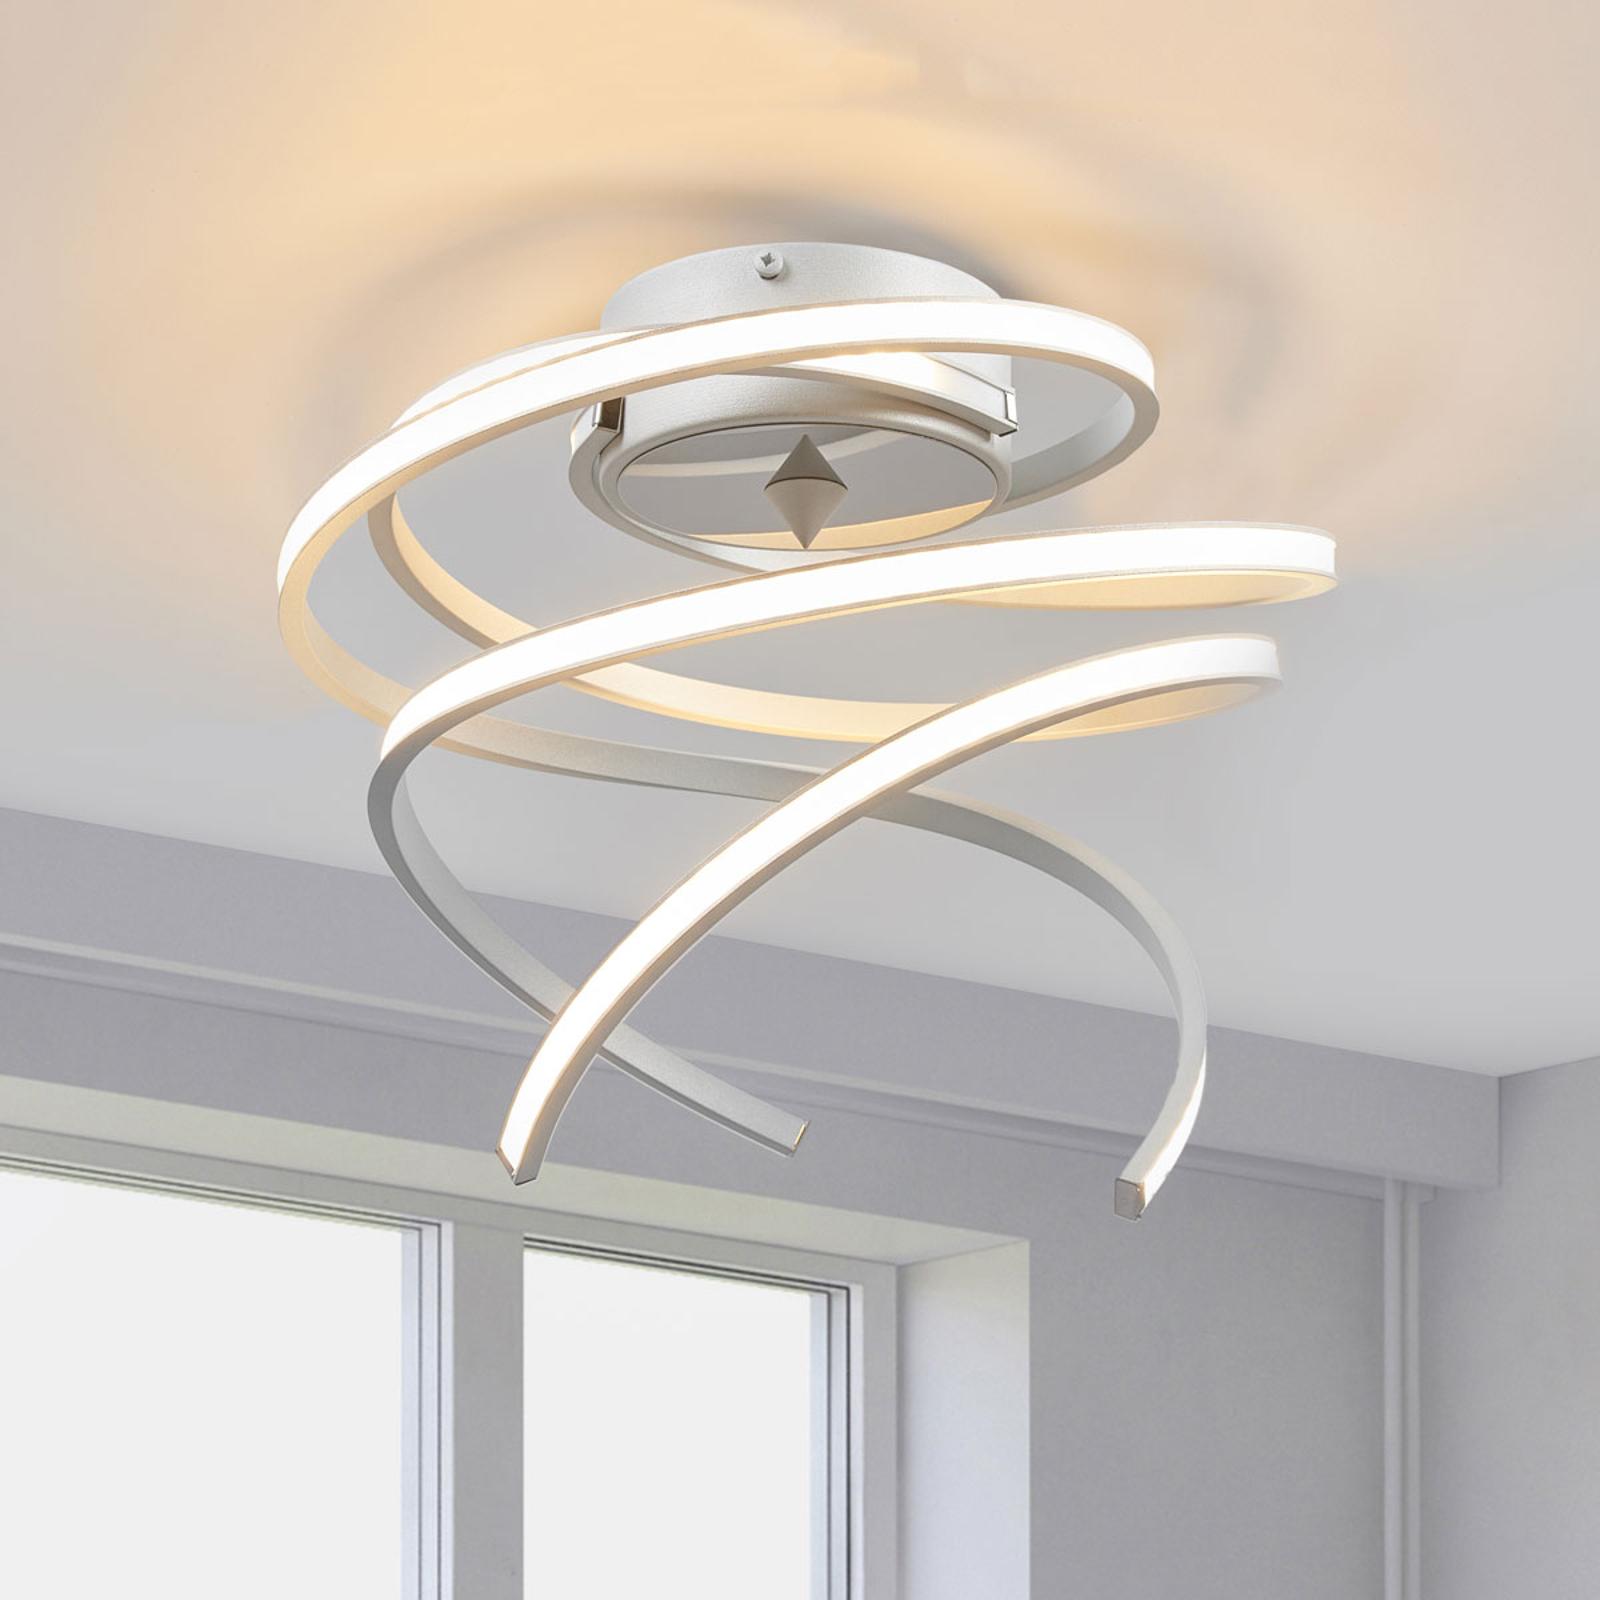 LED-taklampe Lungo alu., høyde 25 cm